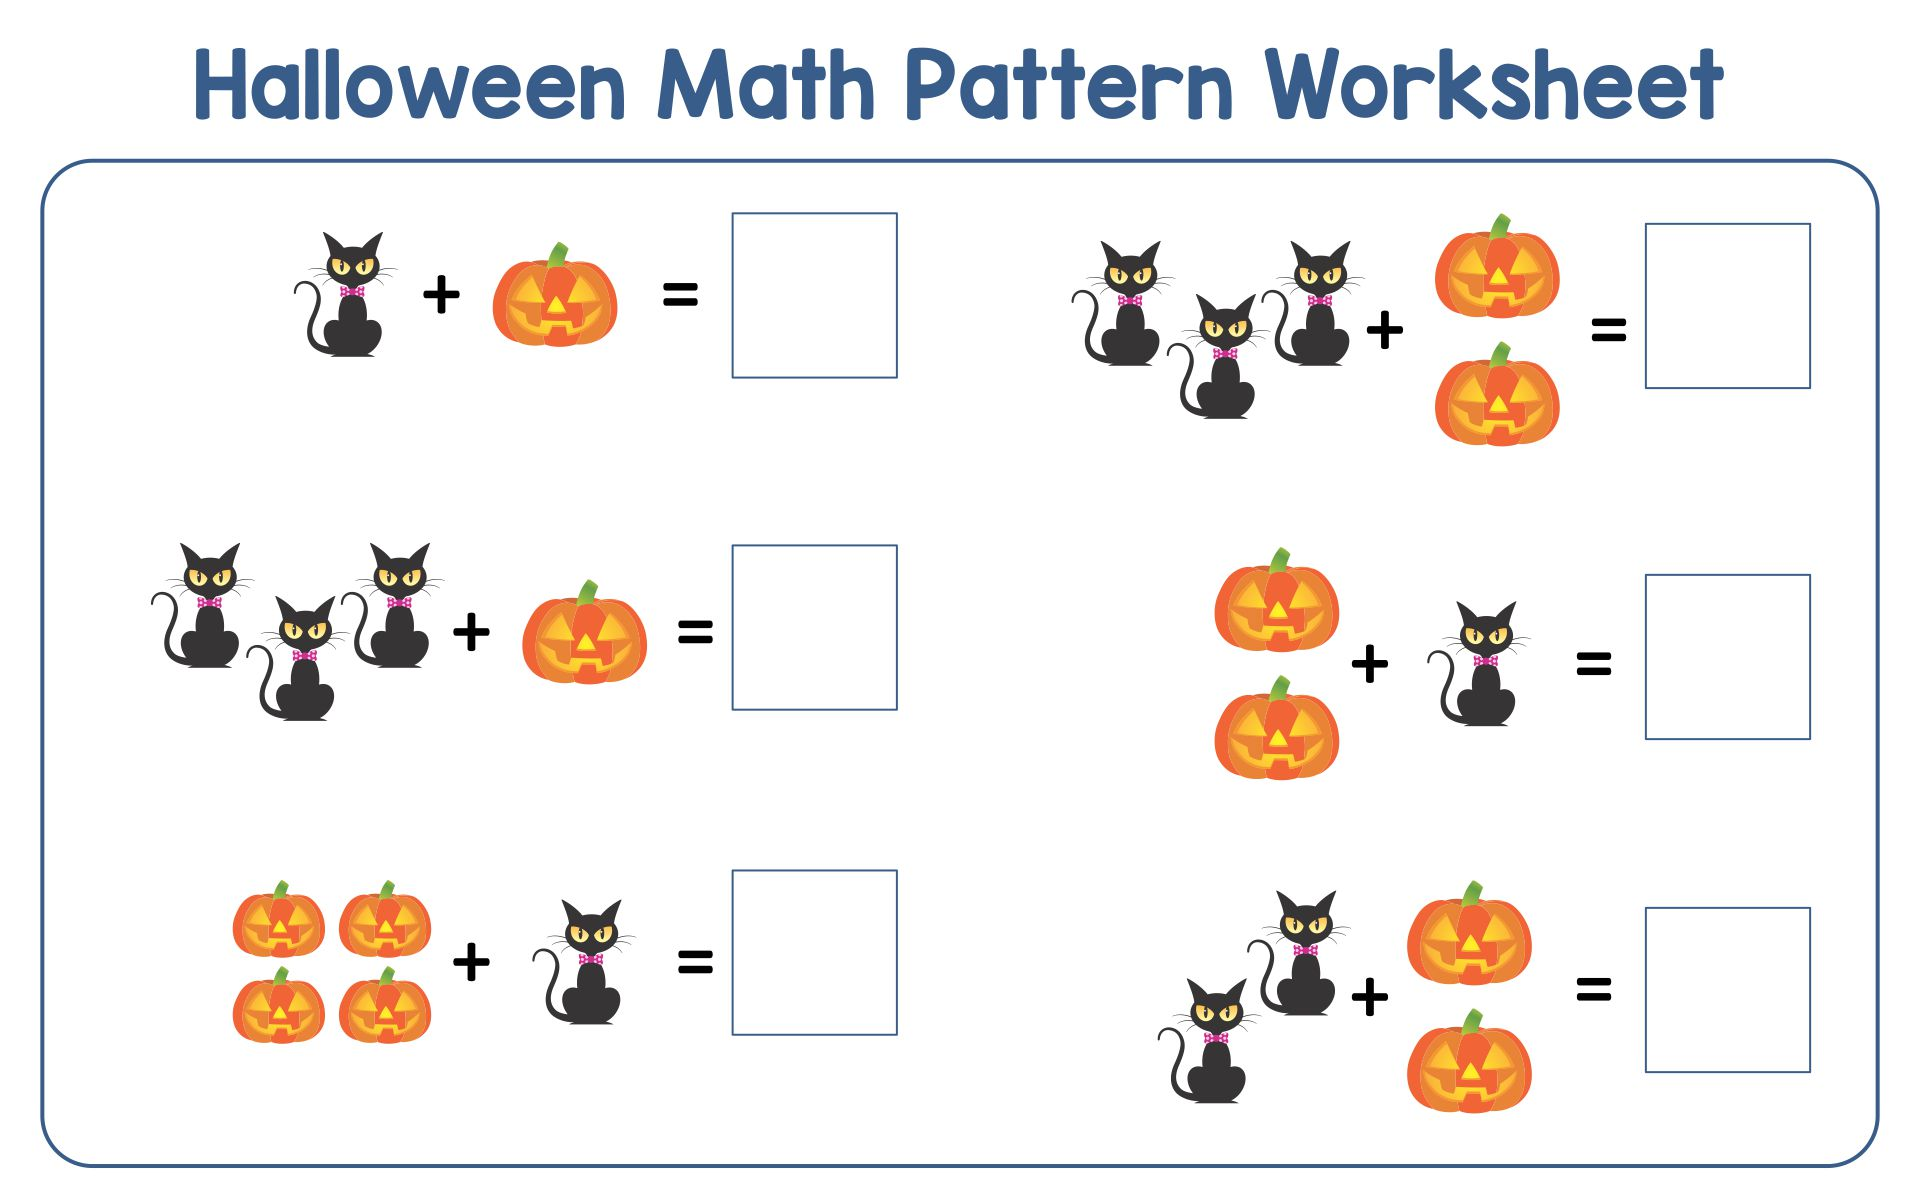 math worksheet : 8 best images of halloween worksheets free printable pattern  : Ab Pattern Worksheets For Kindergarten